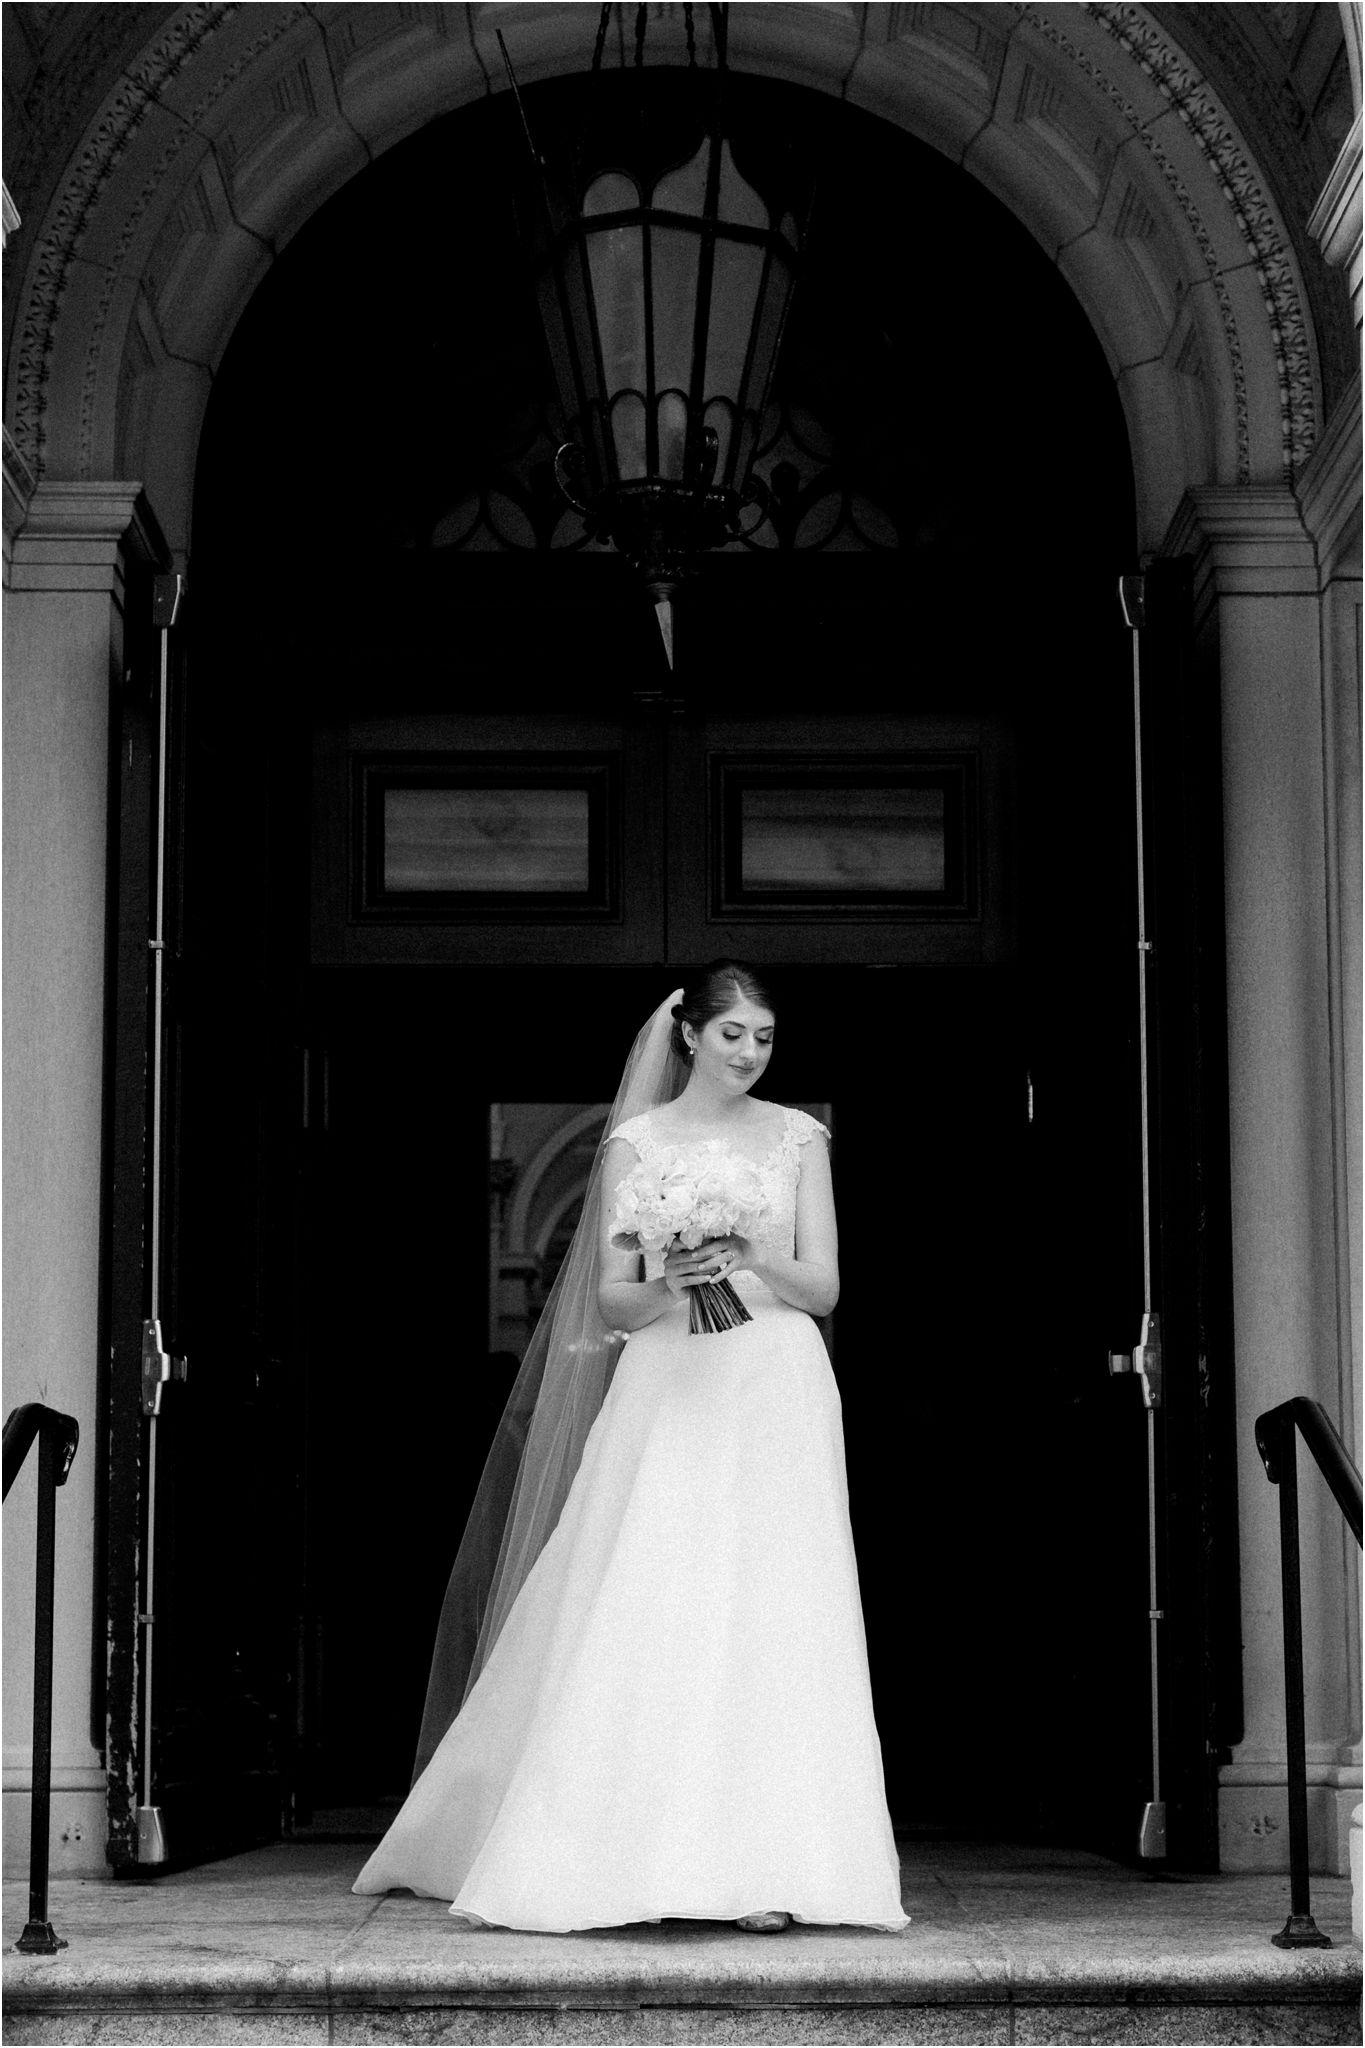 providence-public-library-wedding-images_00014.JPG